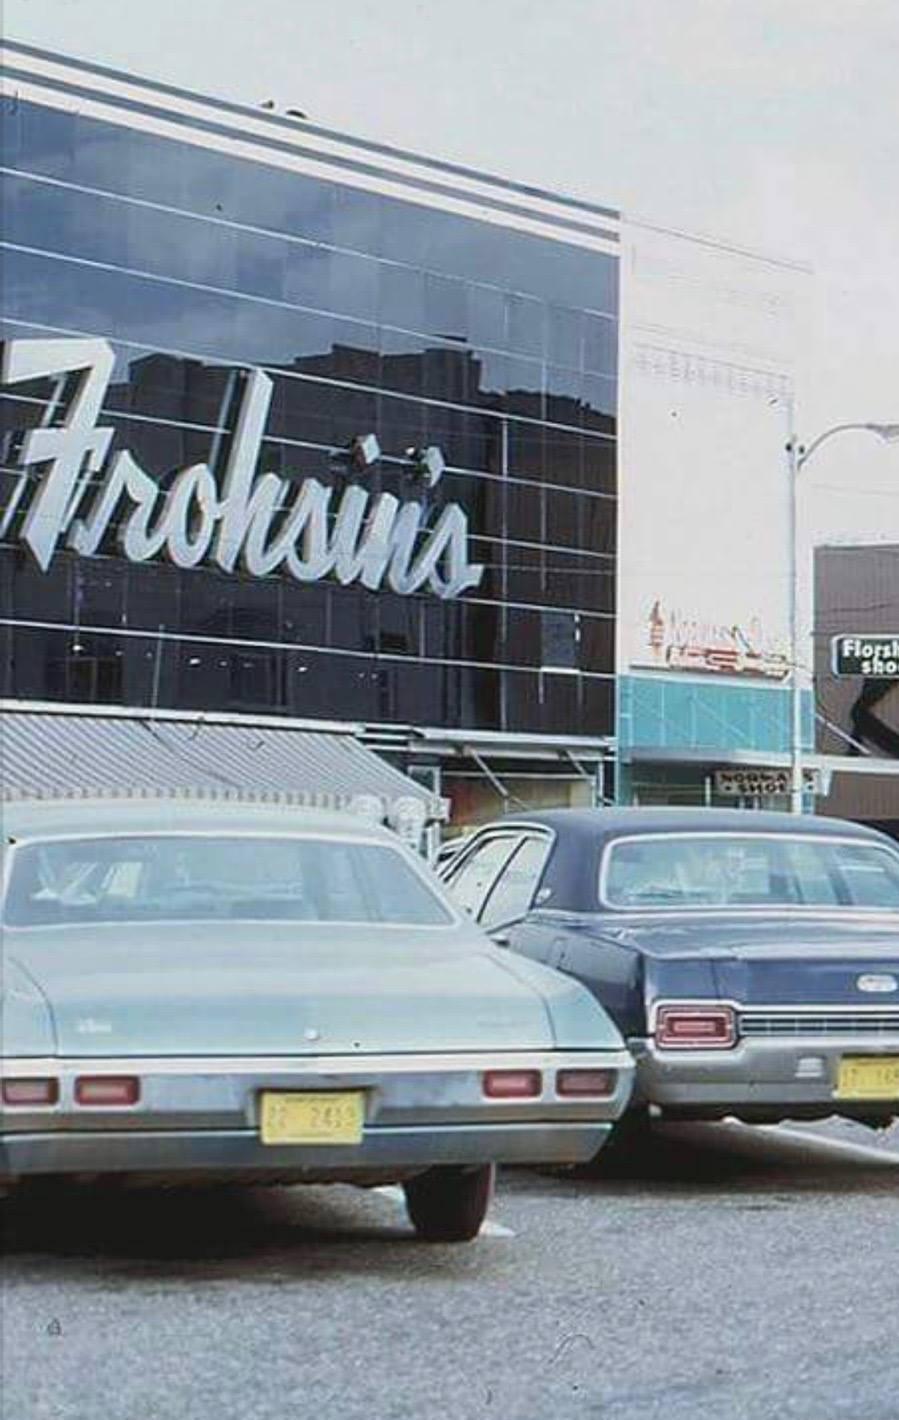 Frohsin's 1980s